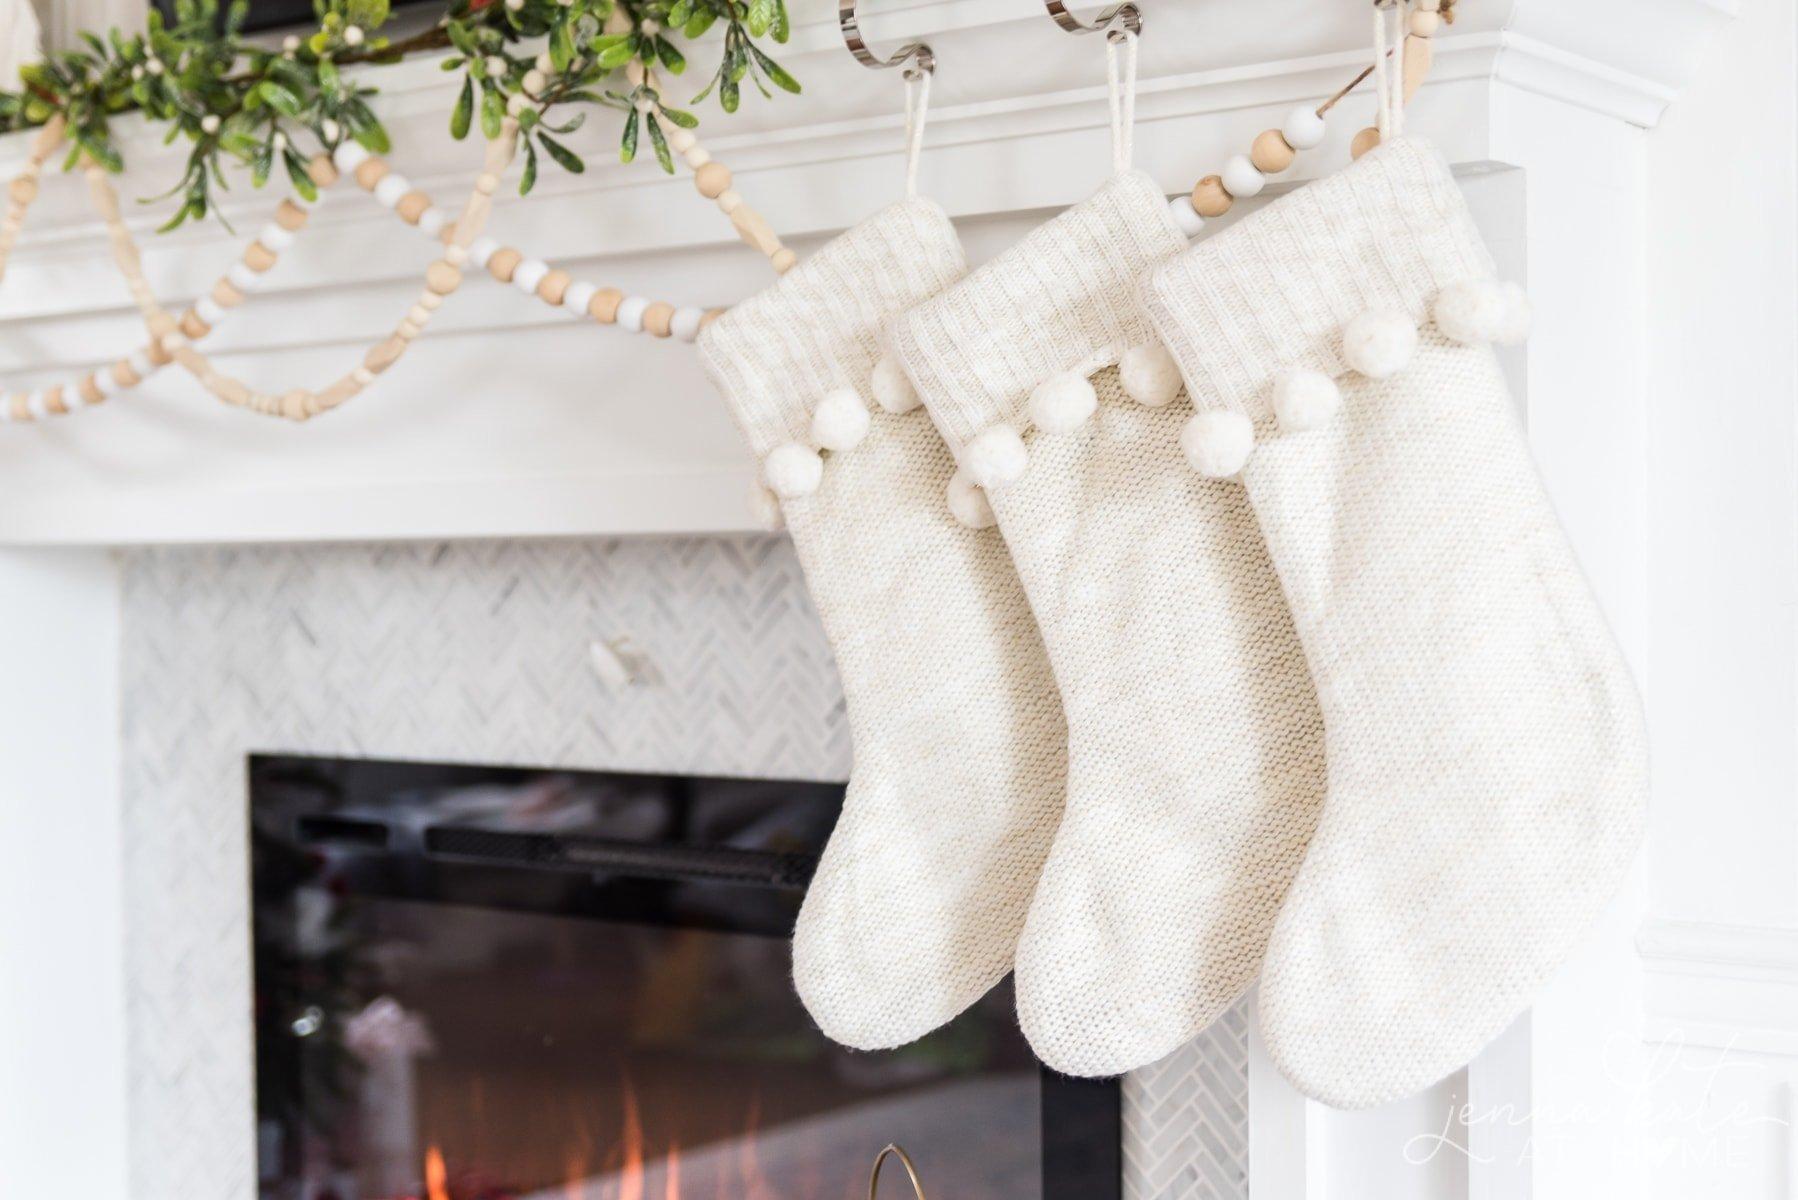 Christmas mantel decorating ideas 2019